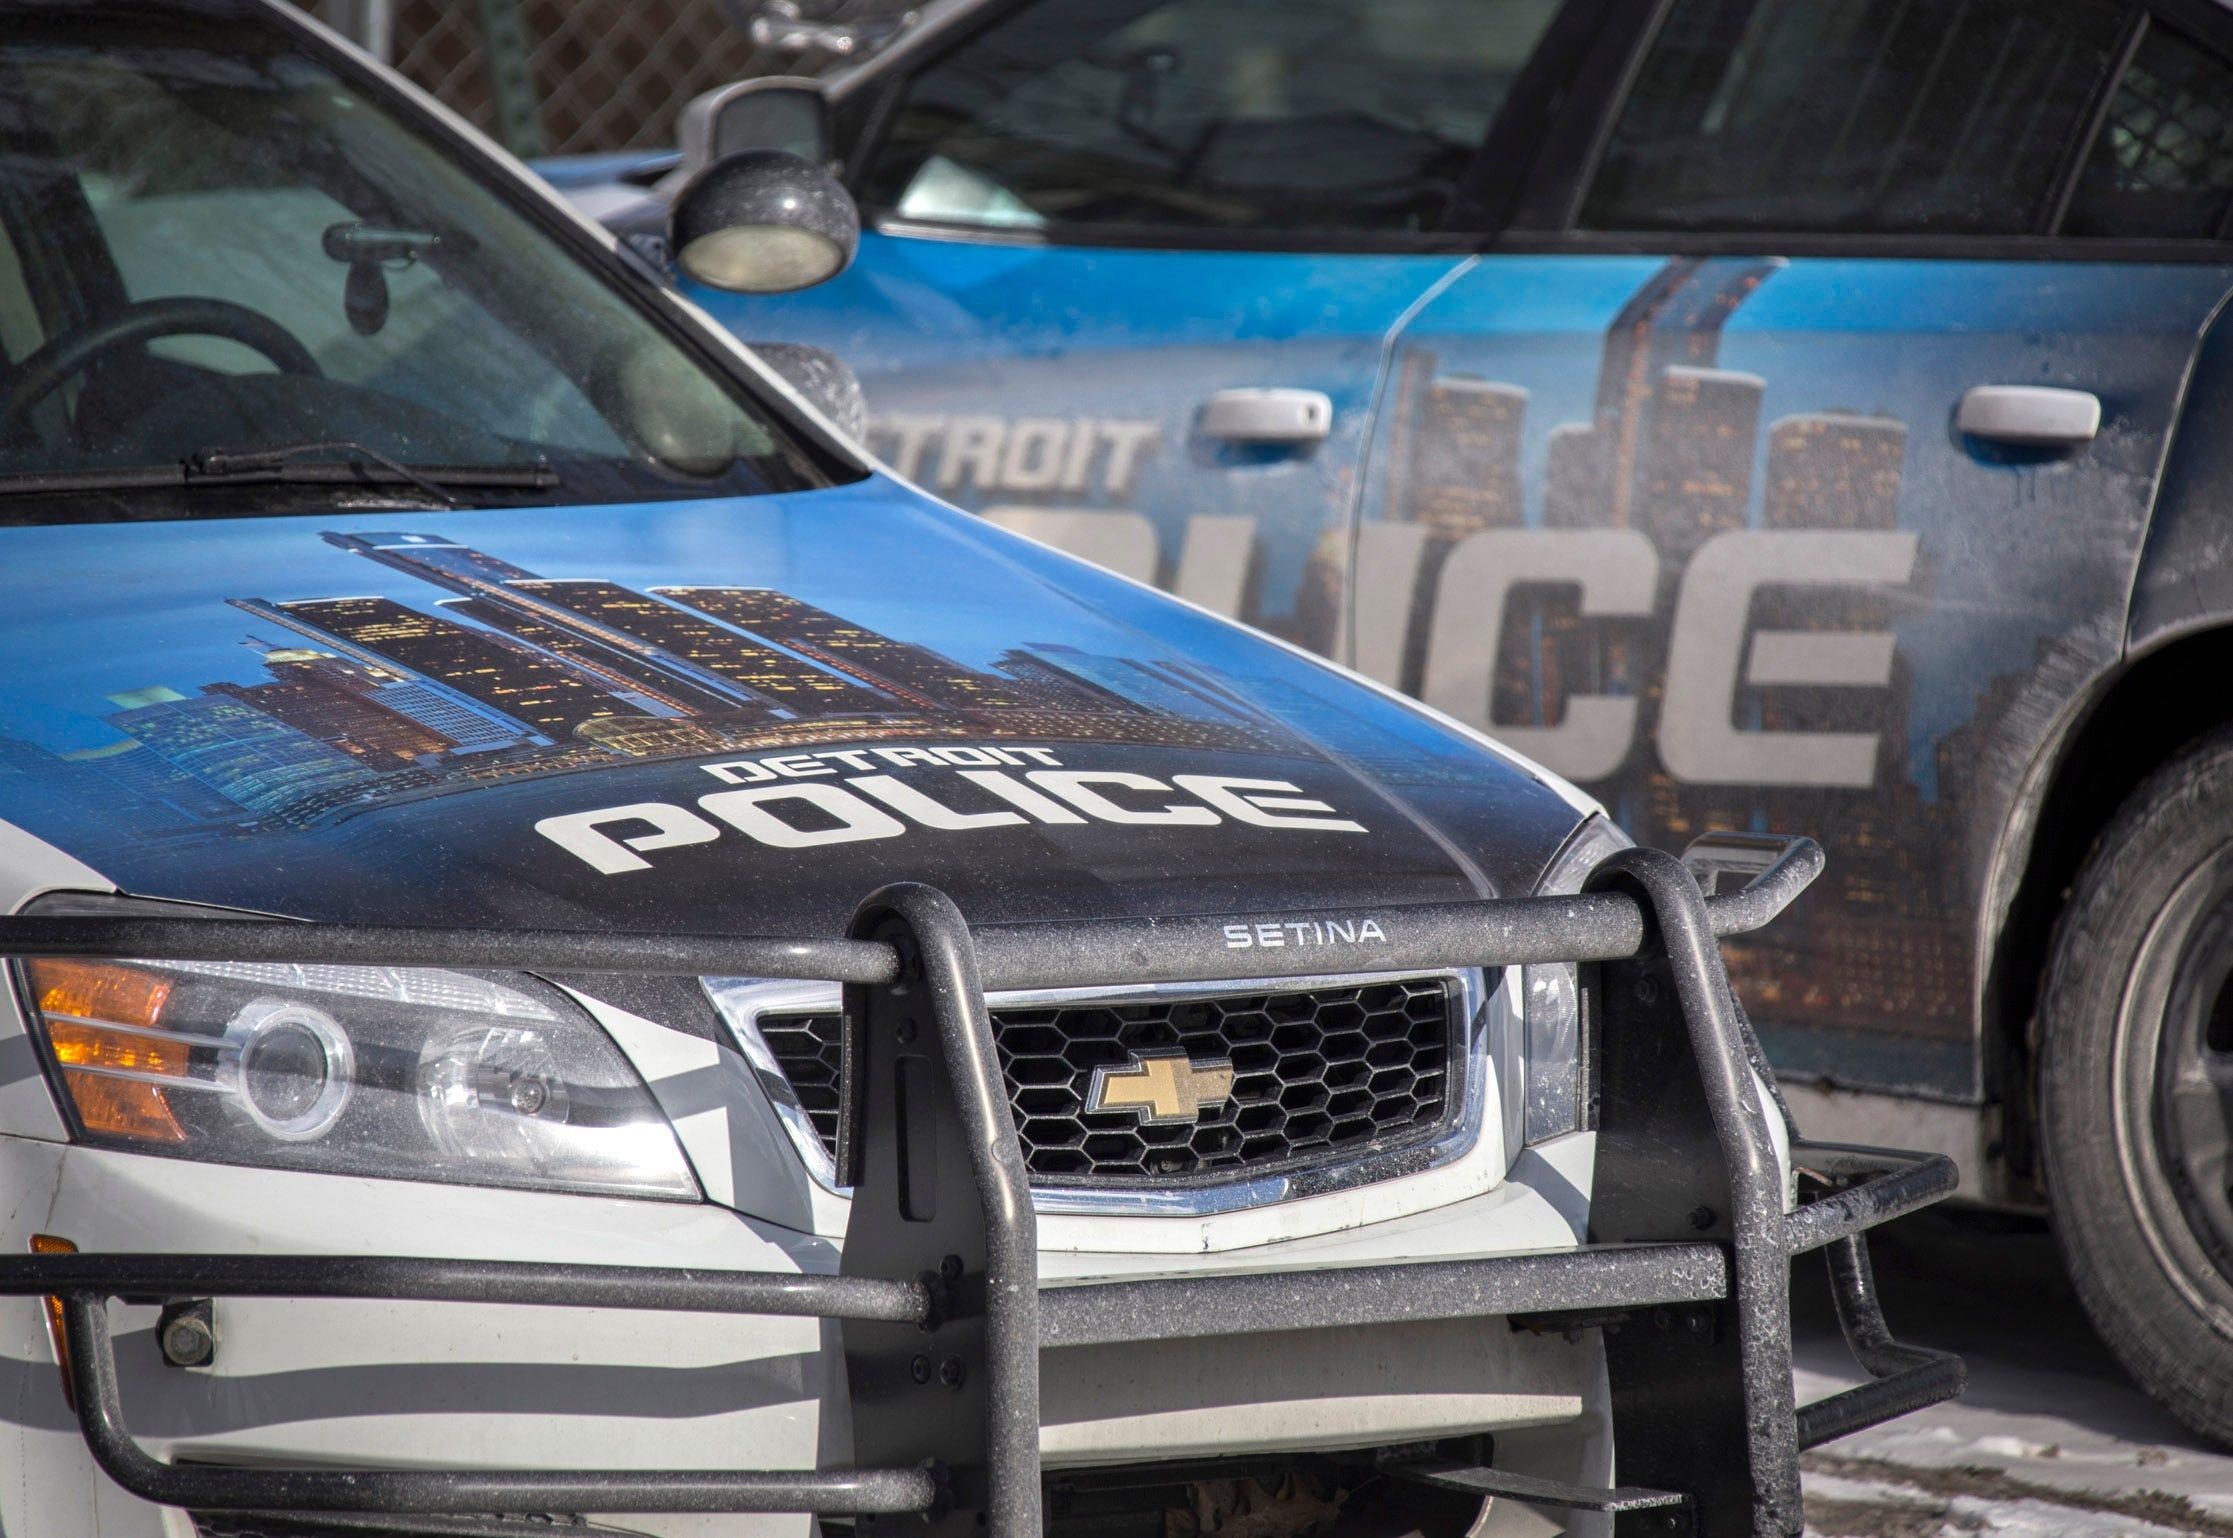 8-year-old girl shot near Detroit gas station, suspect in custody   Detroit Free Press